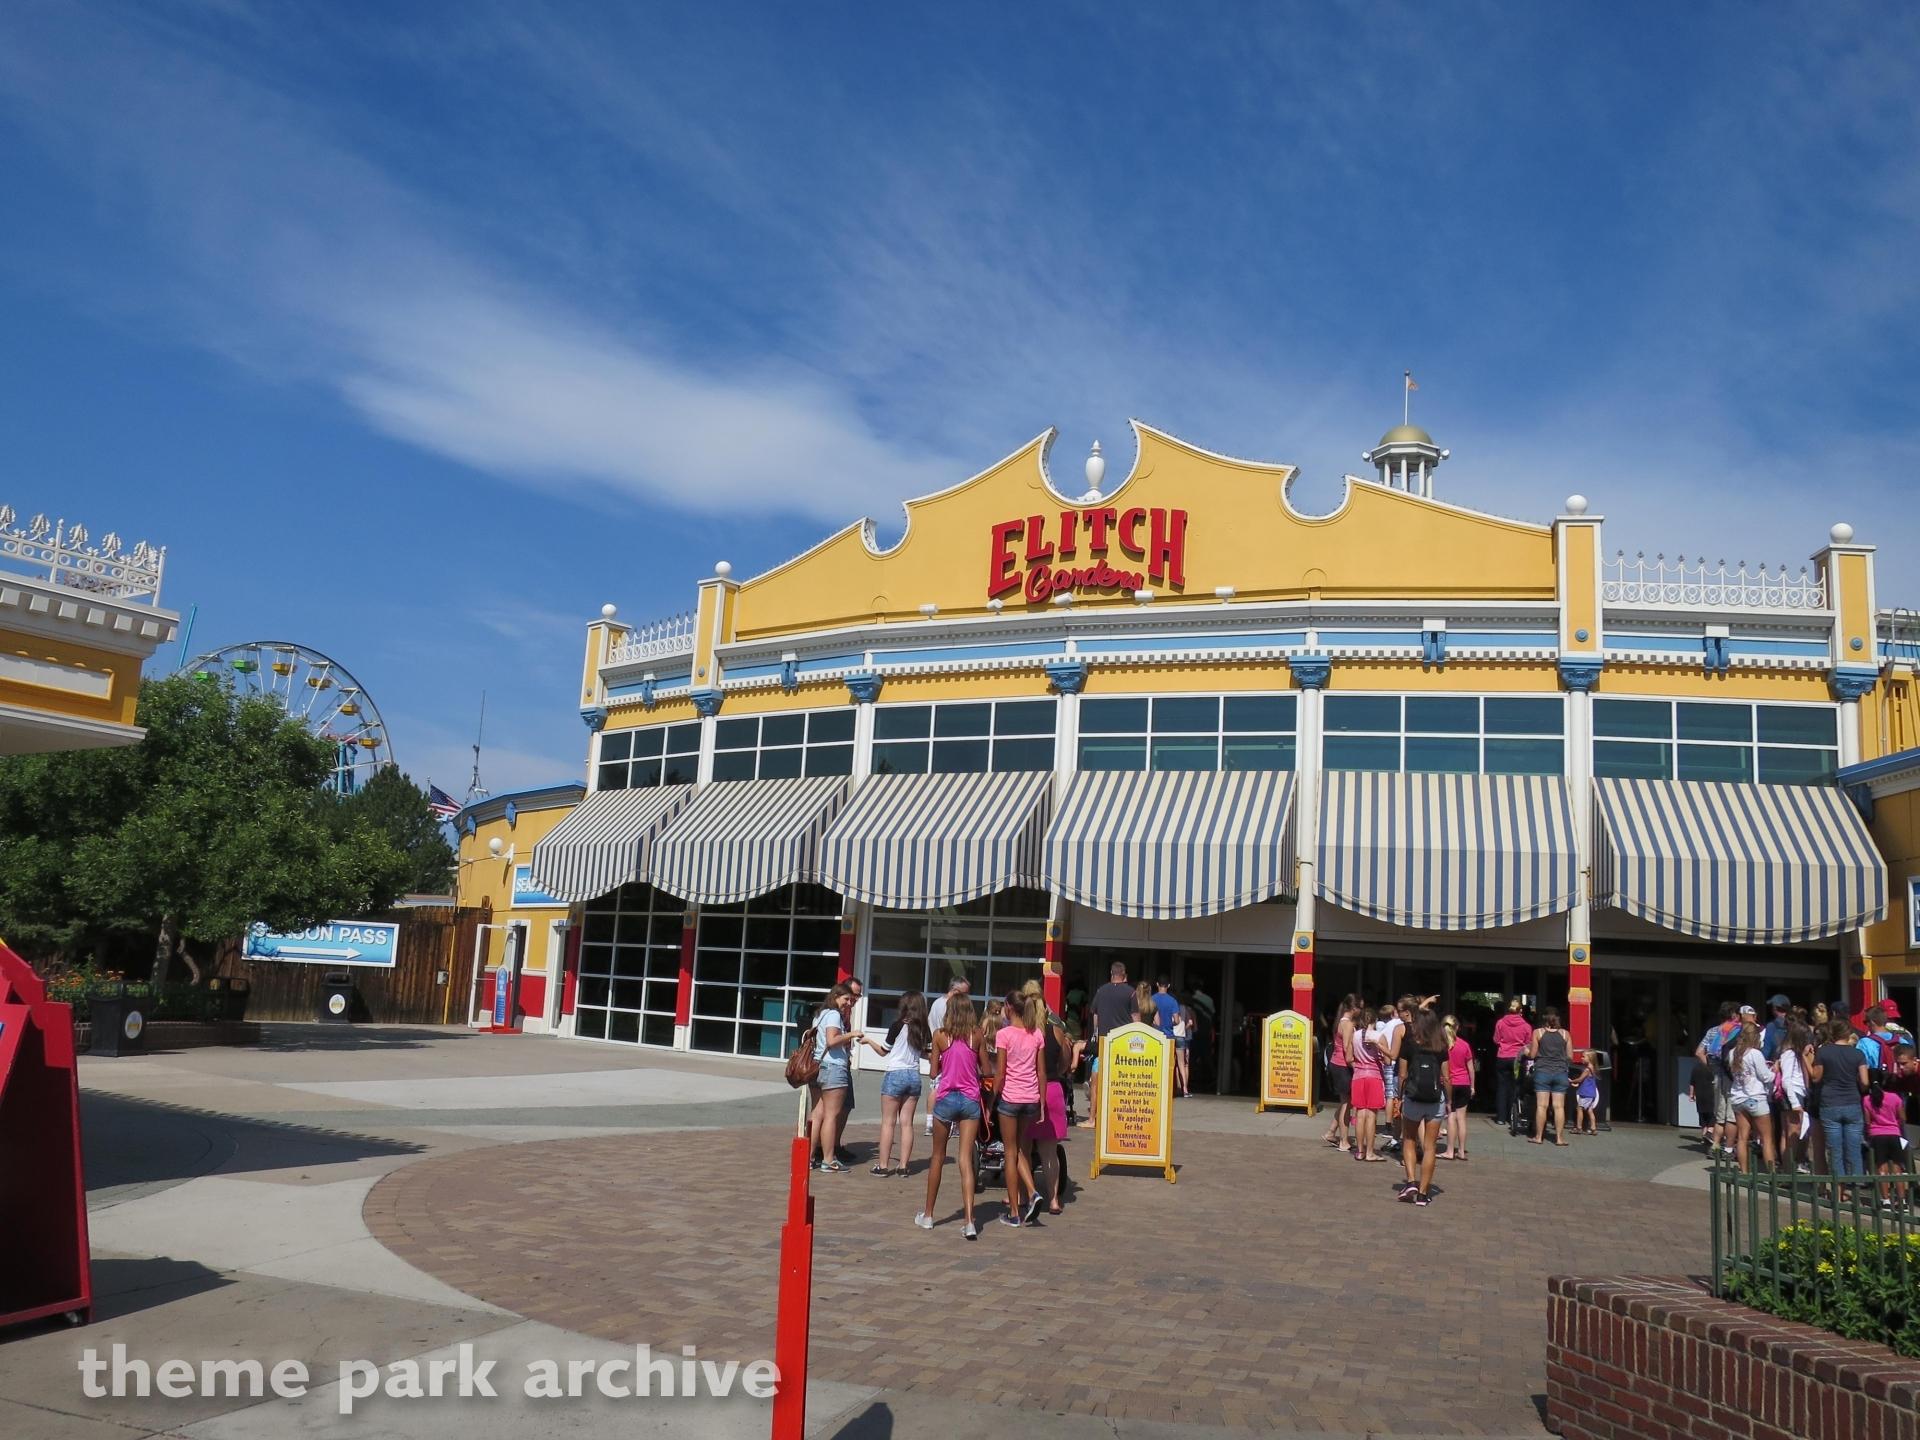 Entrance at Elitch Gardens